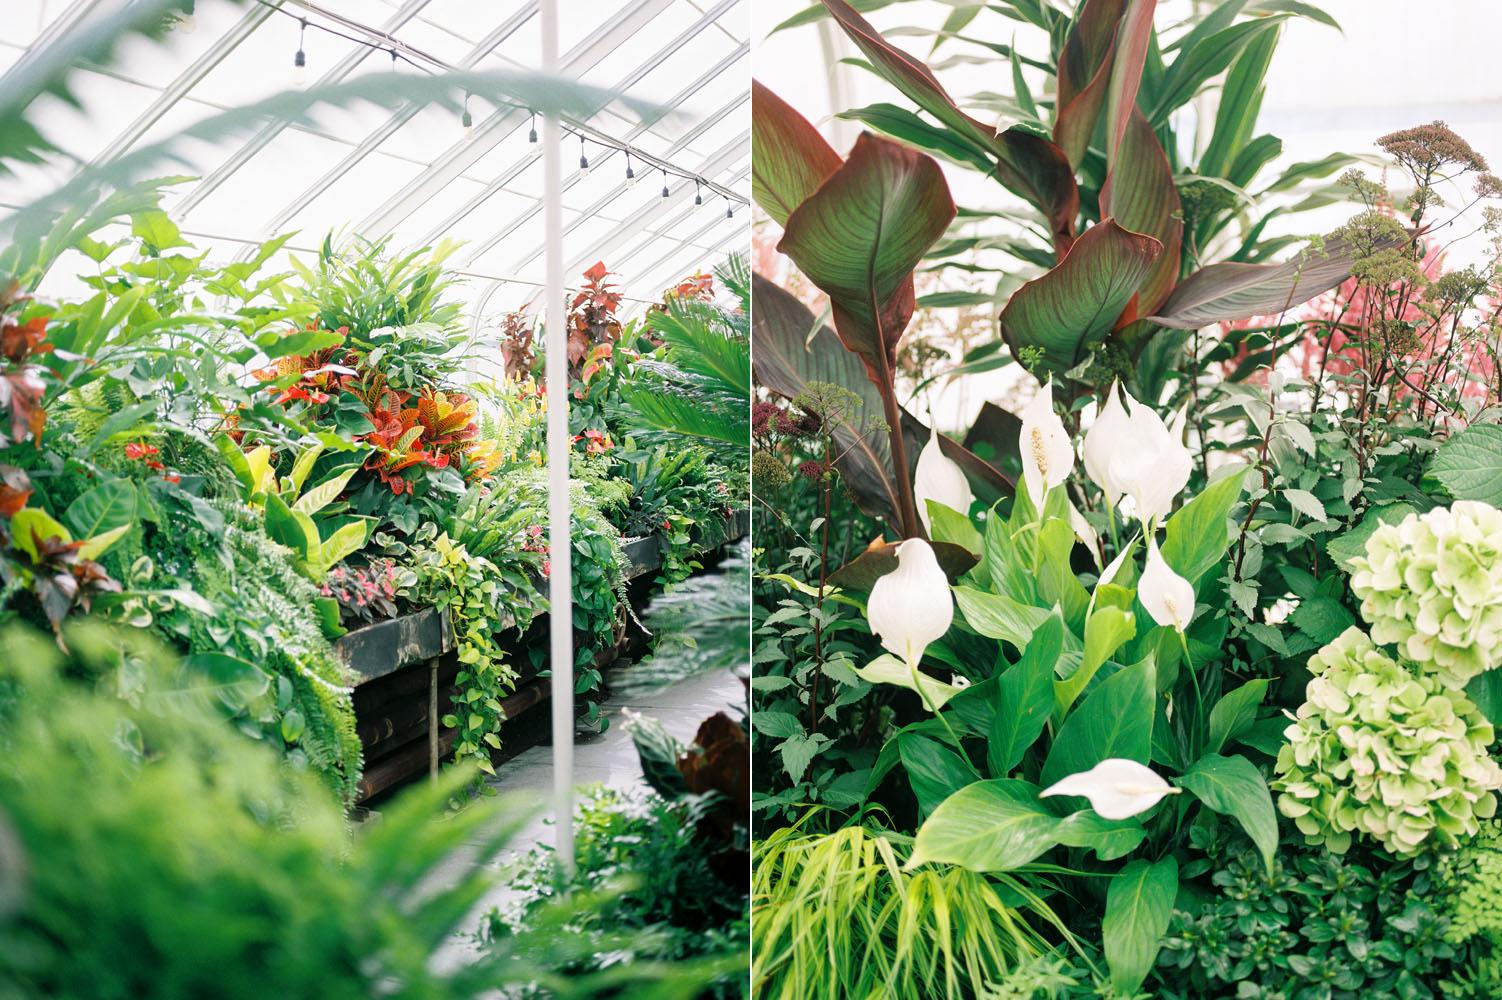 seattle volunteer park conservatory plants.jpg